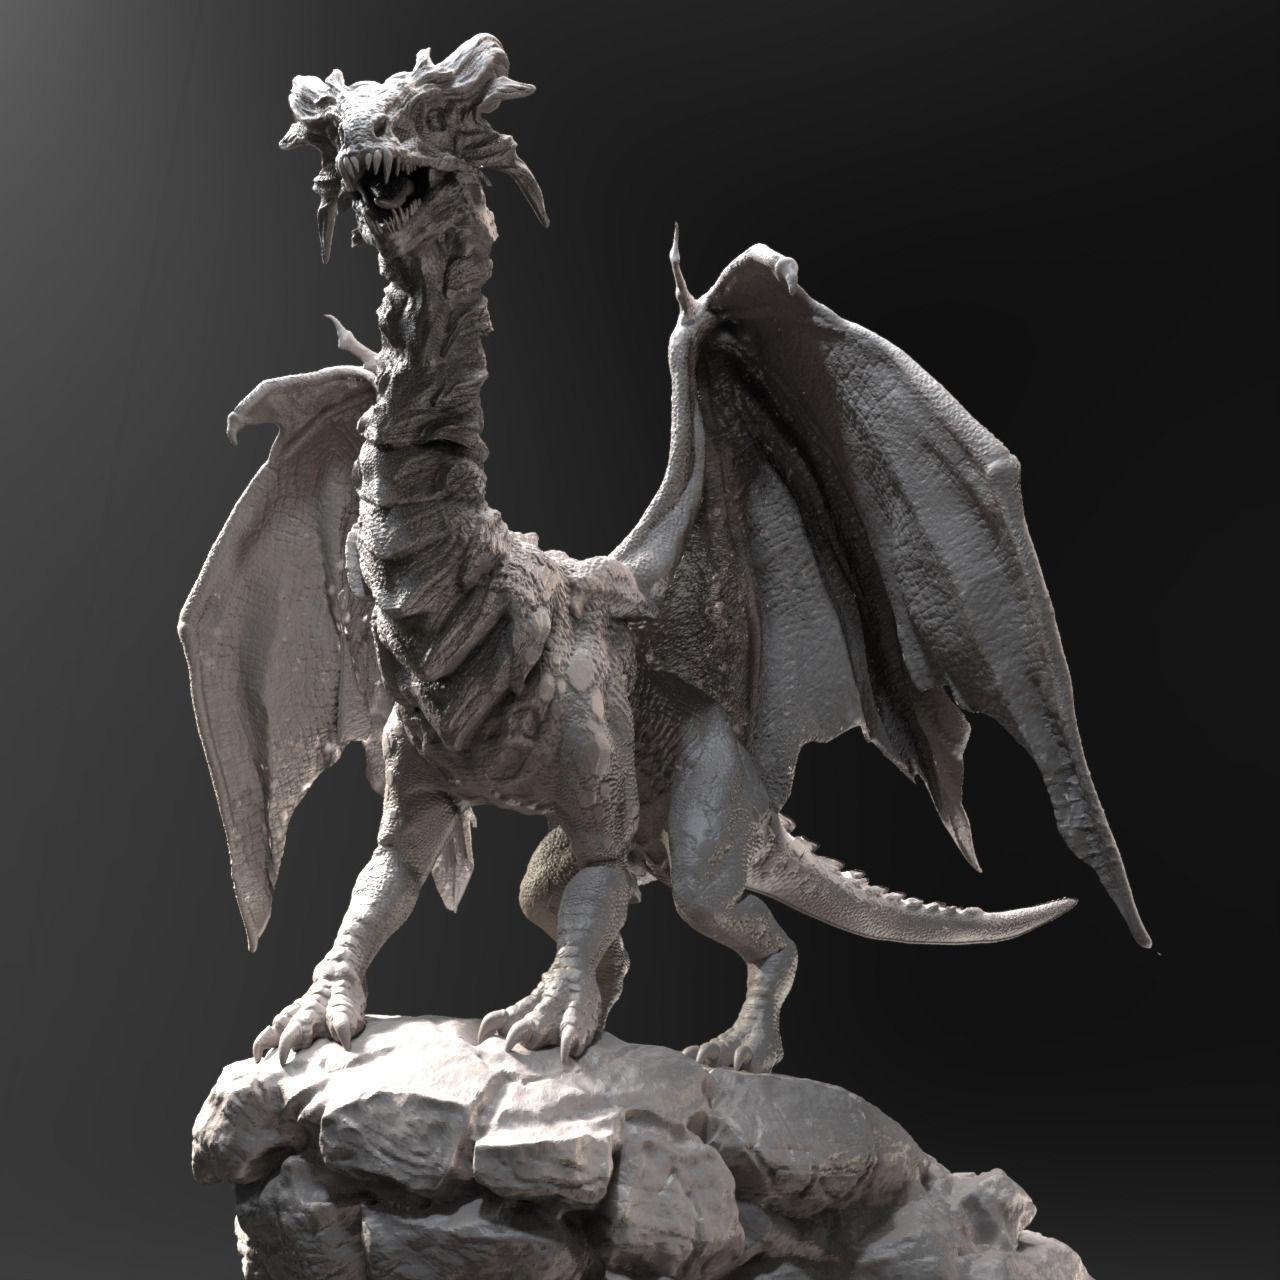 Dragon Zbrush HD